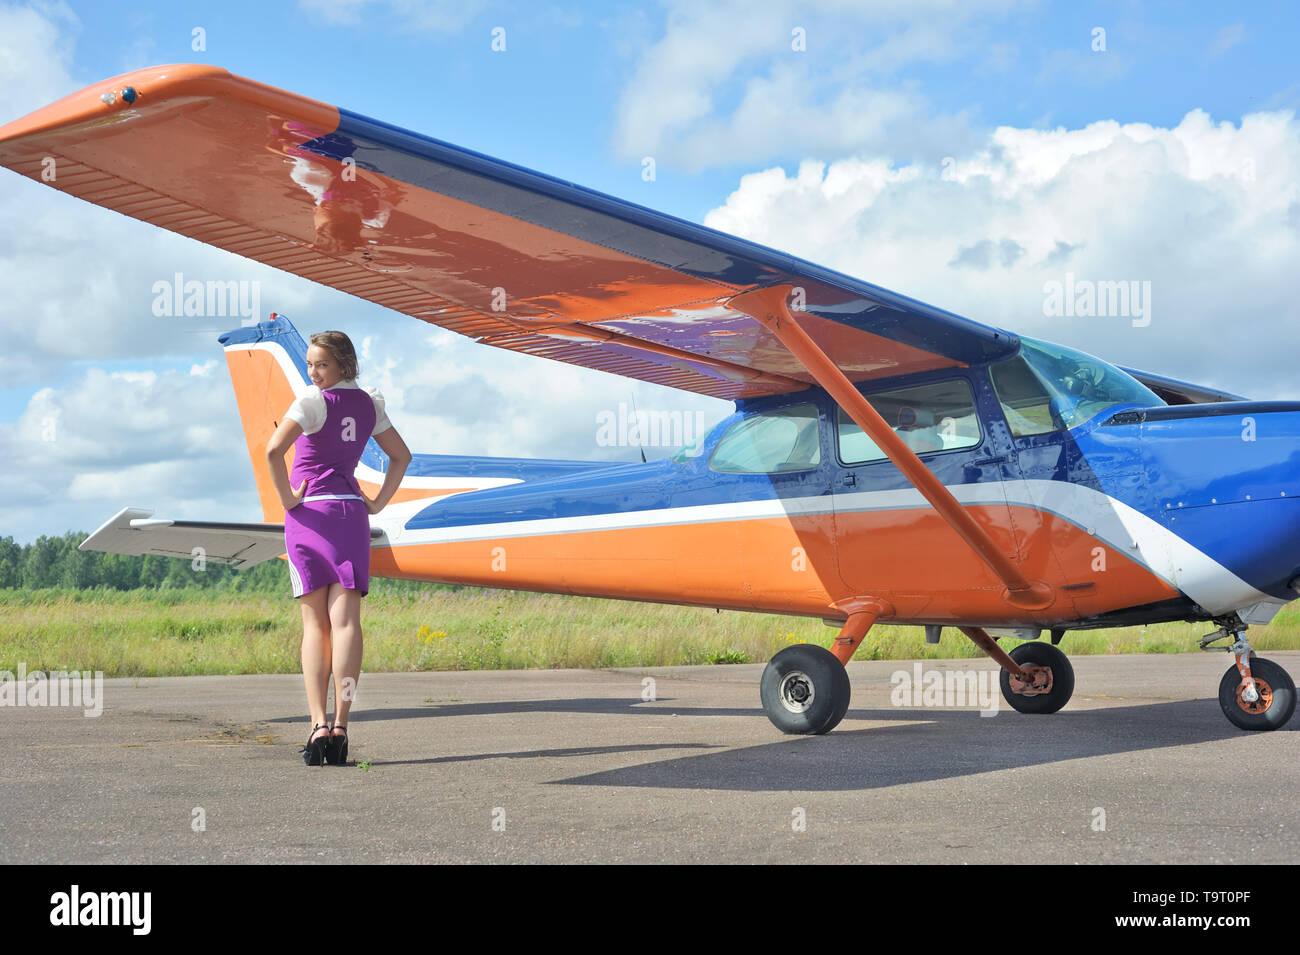 Pretty flight attendant near the small plane outdoors - Stock Image